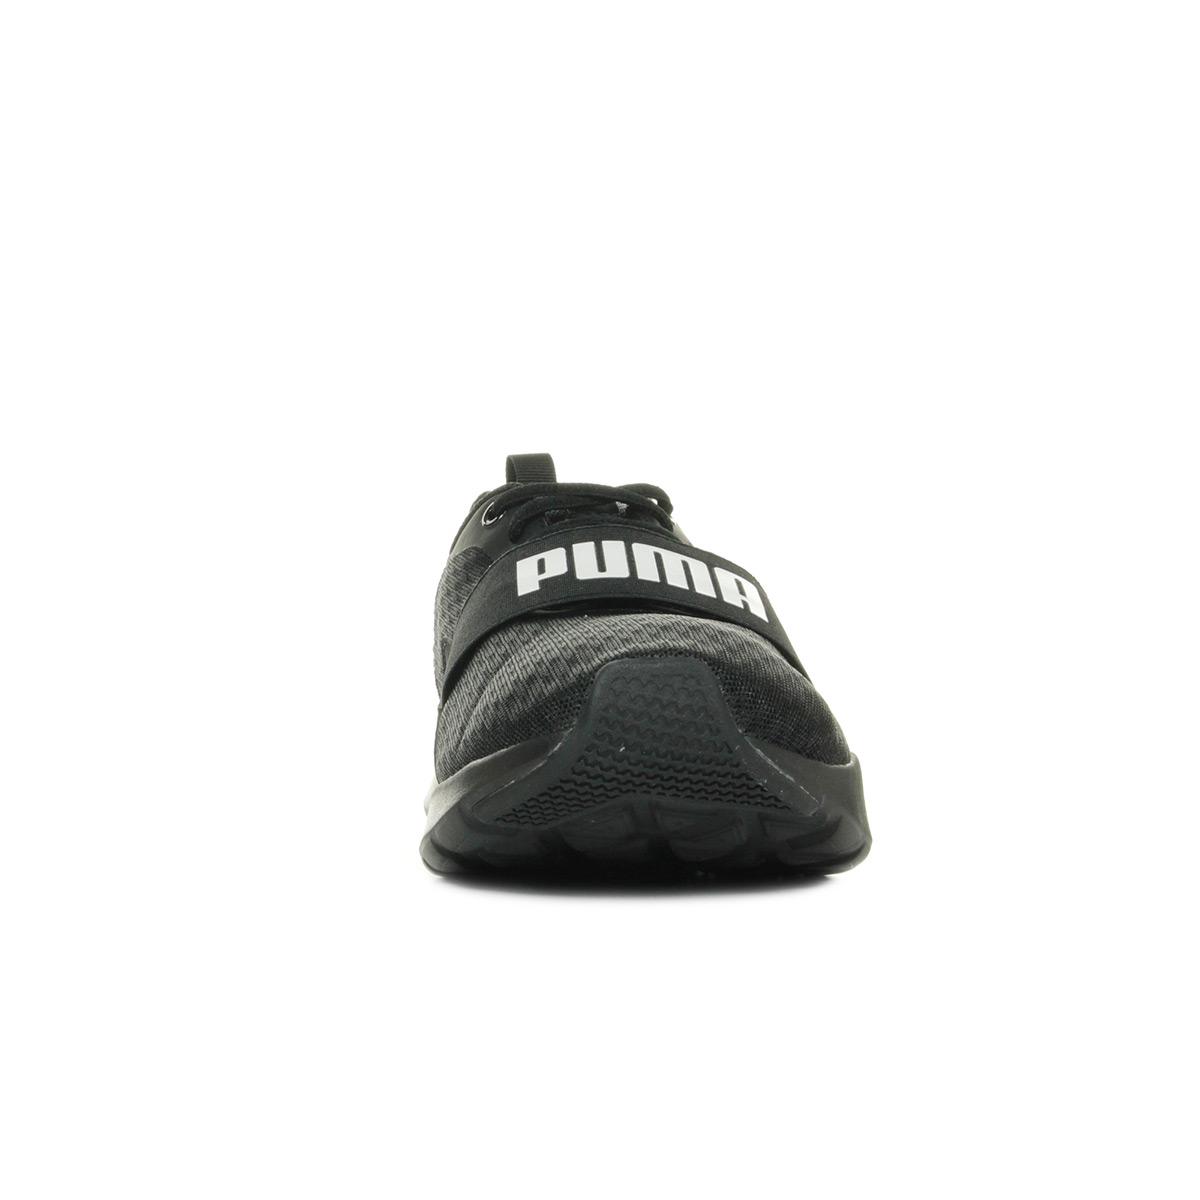 Puma Puma Wired 36697001, Baskets mode homme